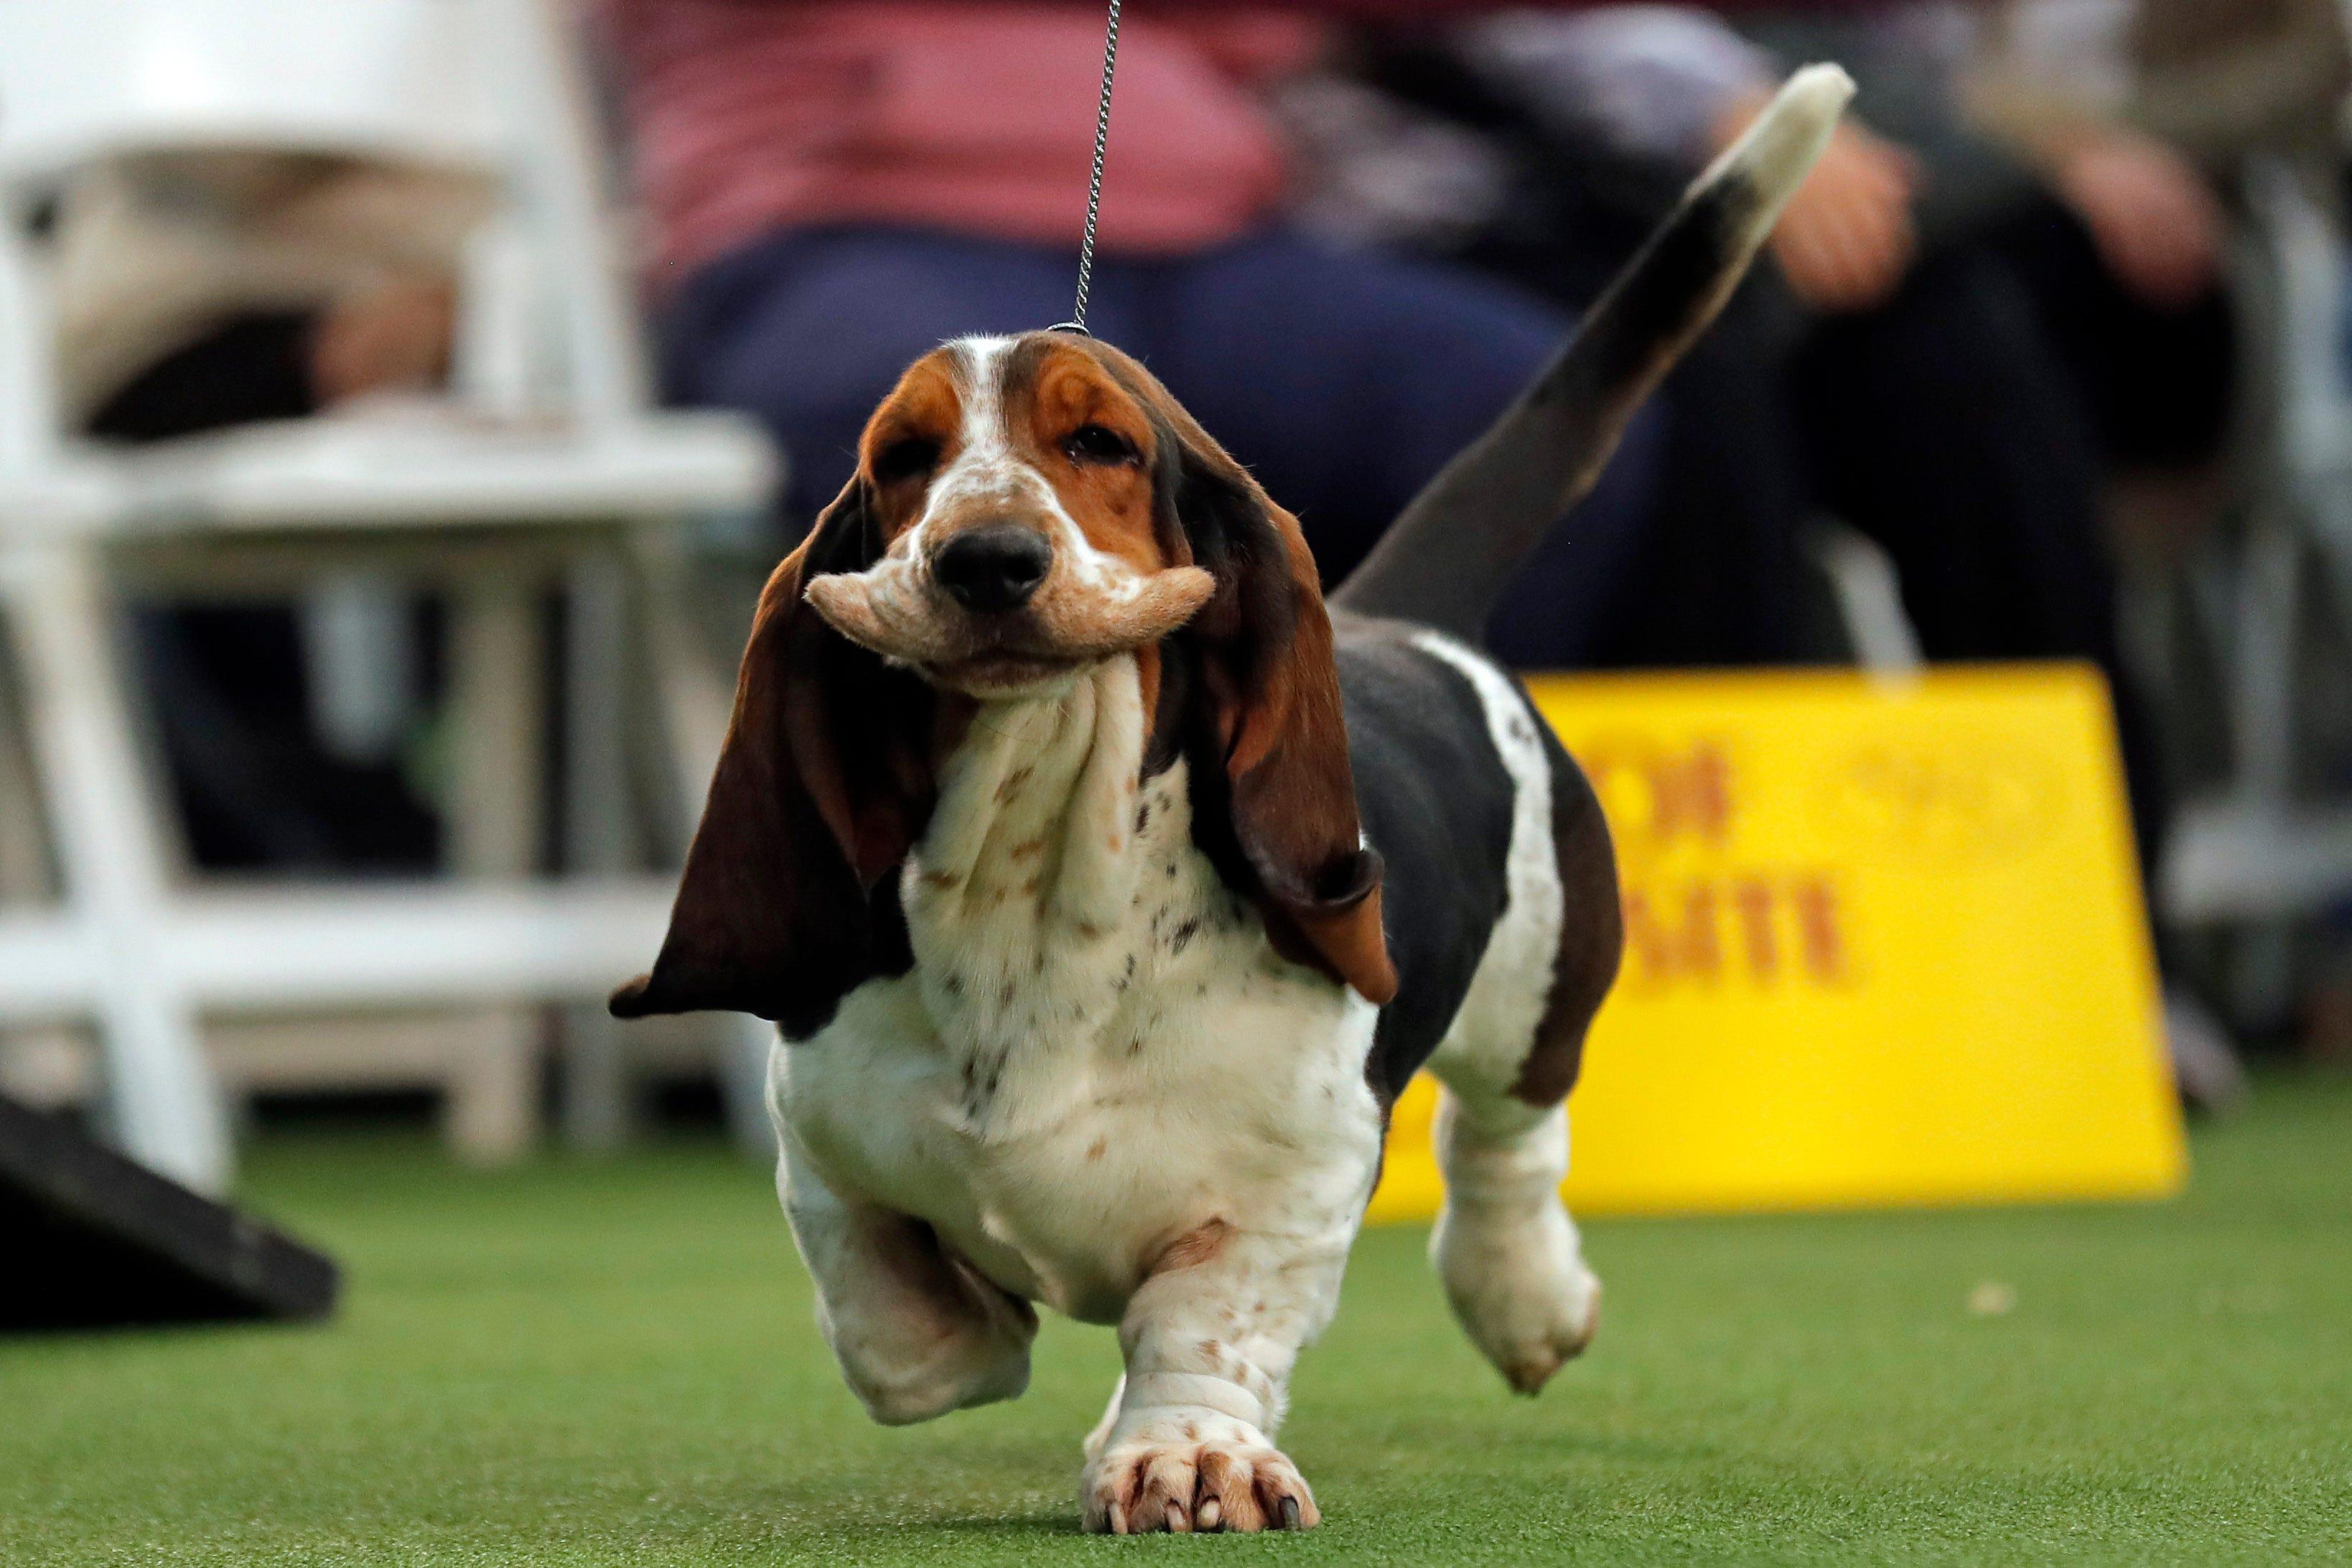 Westlake Legal Group 84f3c049-9670-4622-807e-c6788f12d105-USP_News-_Westminster_Kennel_Club_Dog_Show.2 Westminster Dog Show